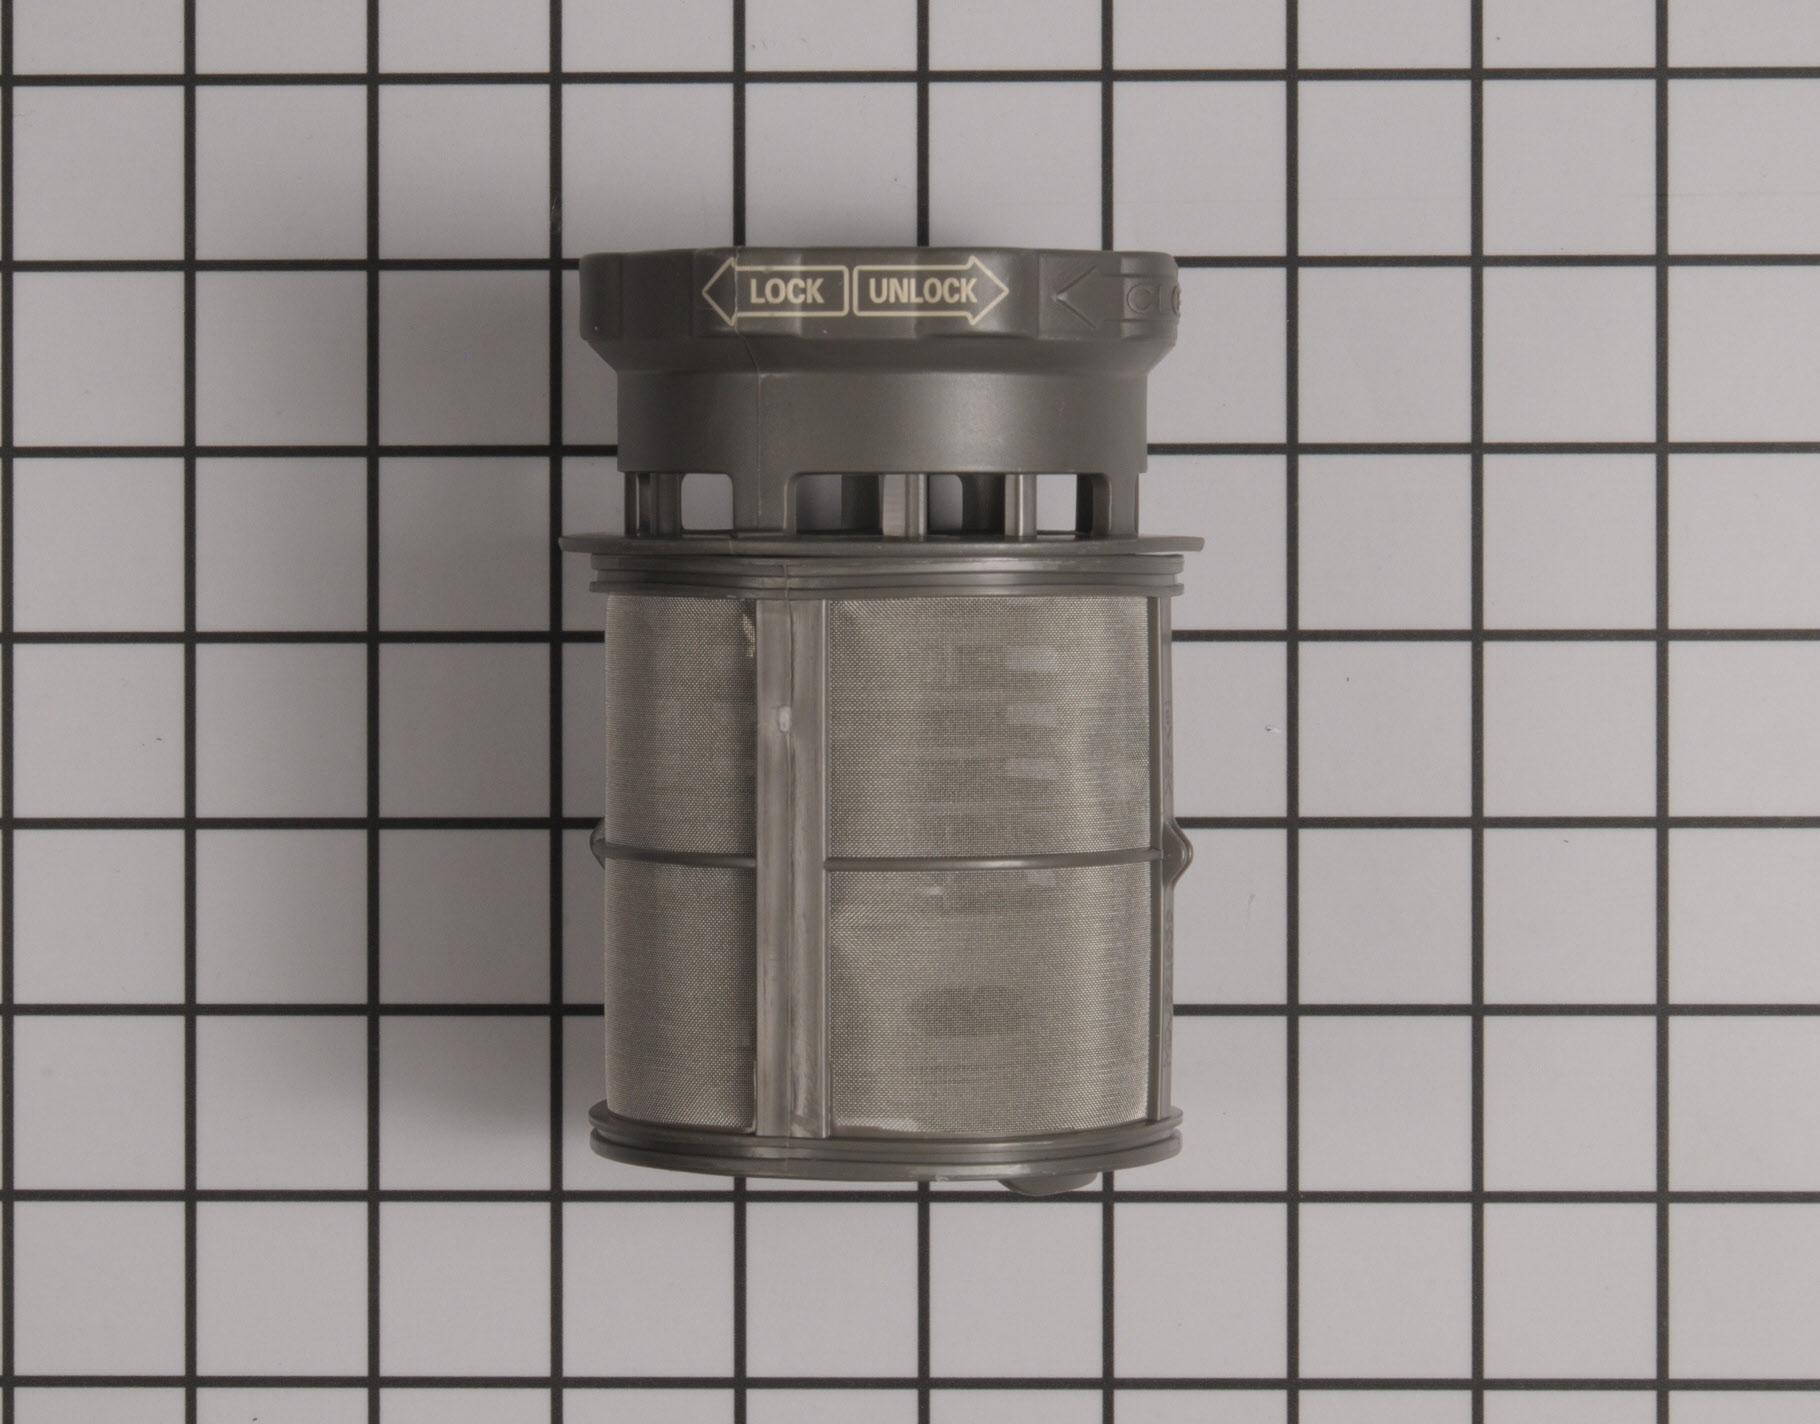 LG Dishwasher Part # ADQ73234003 - Filter